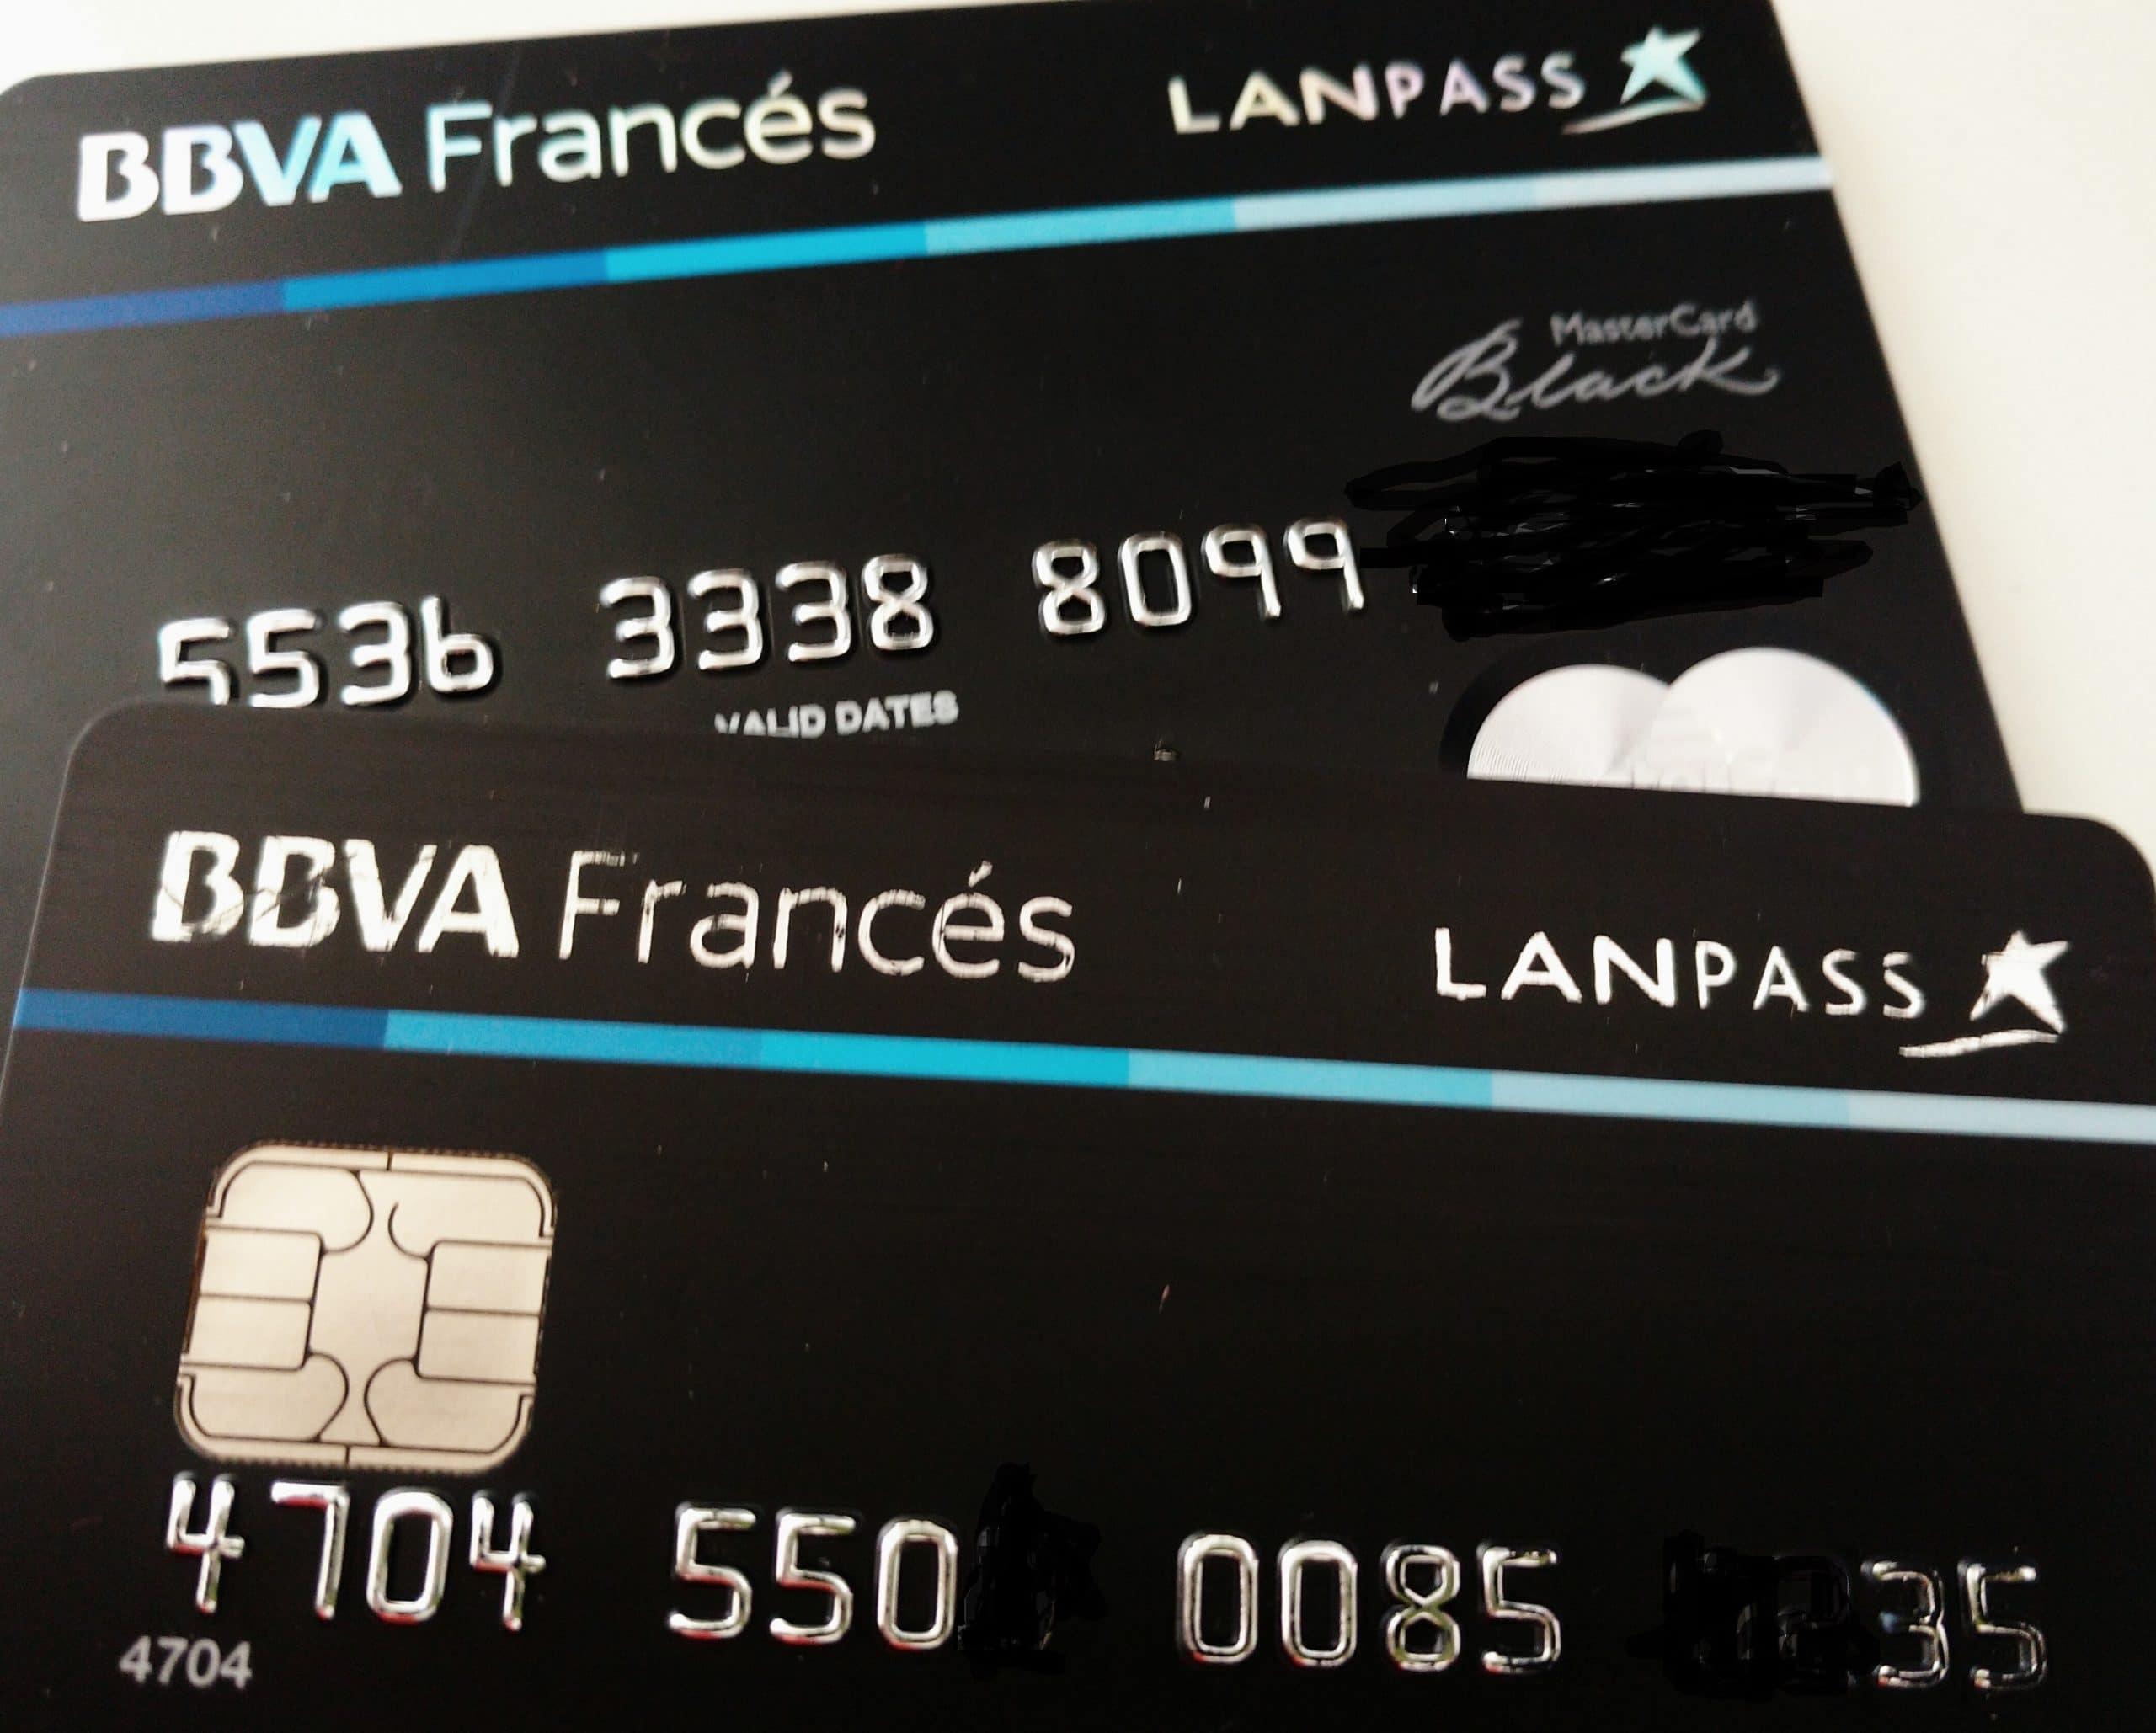 Lanpass Argentina